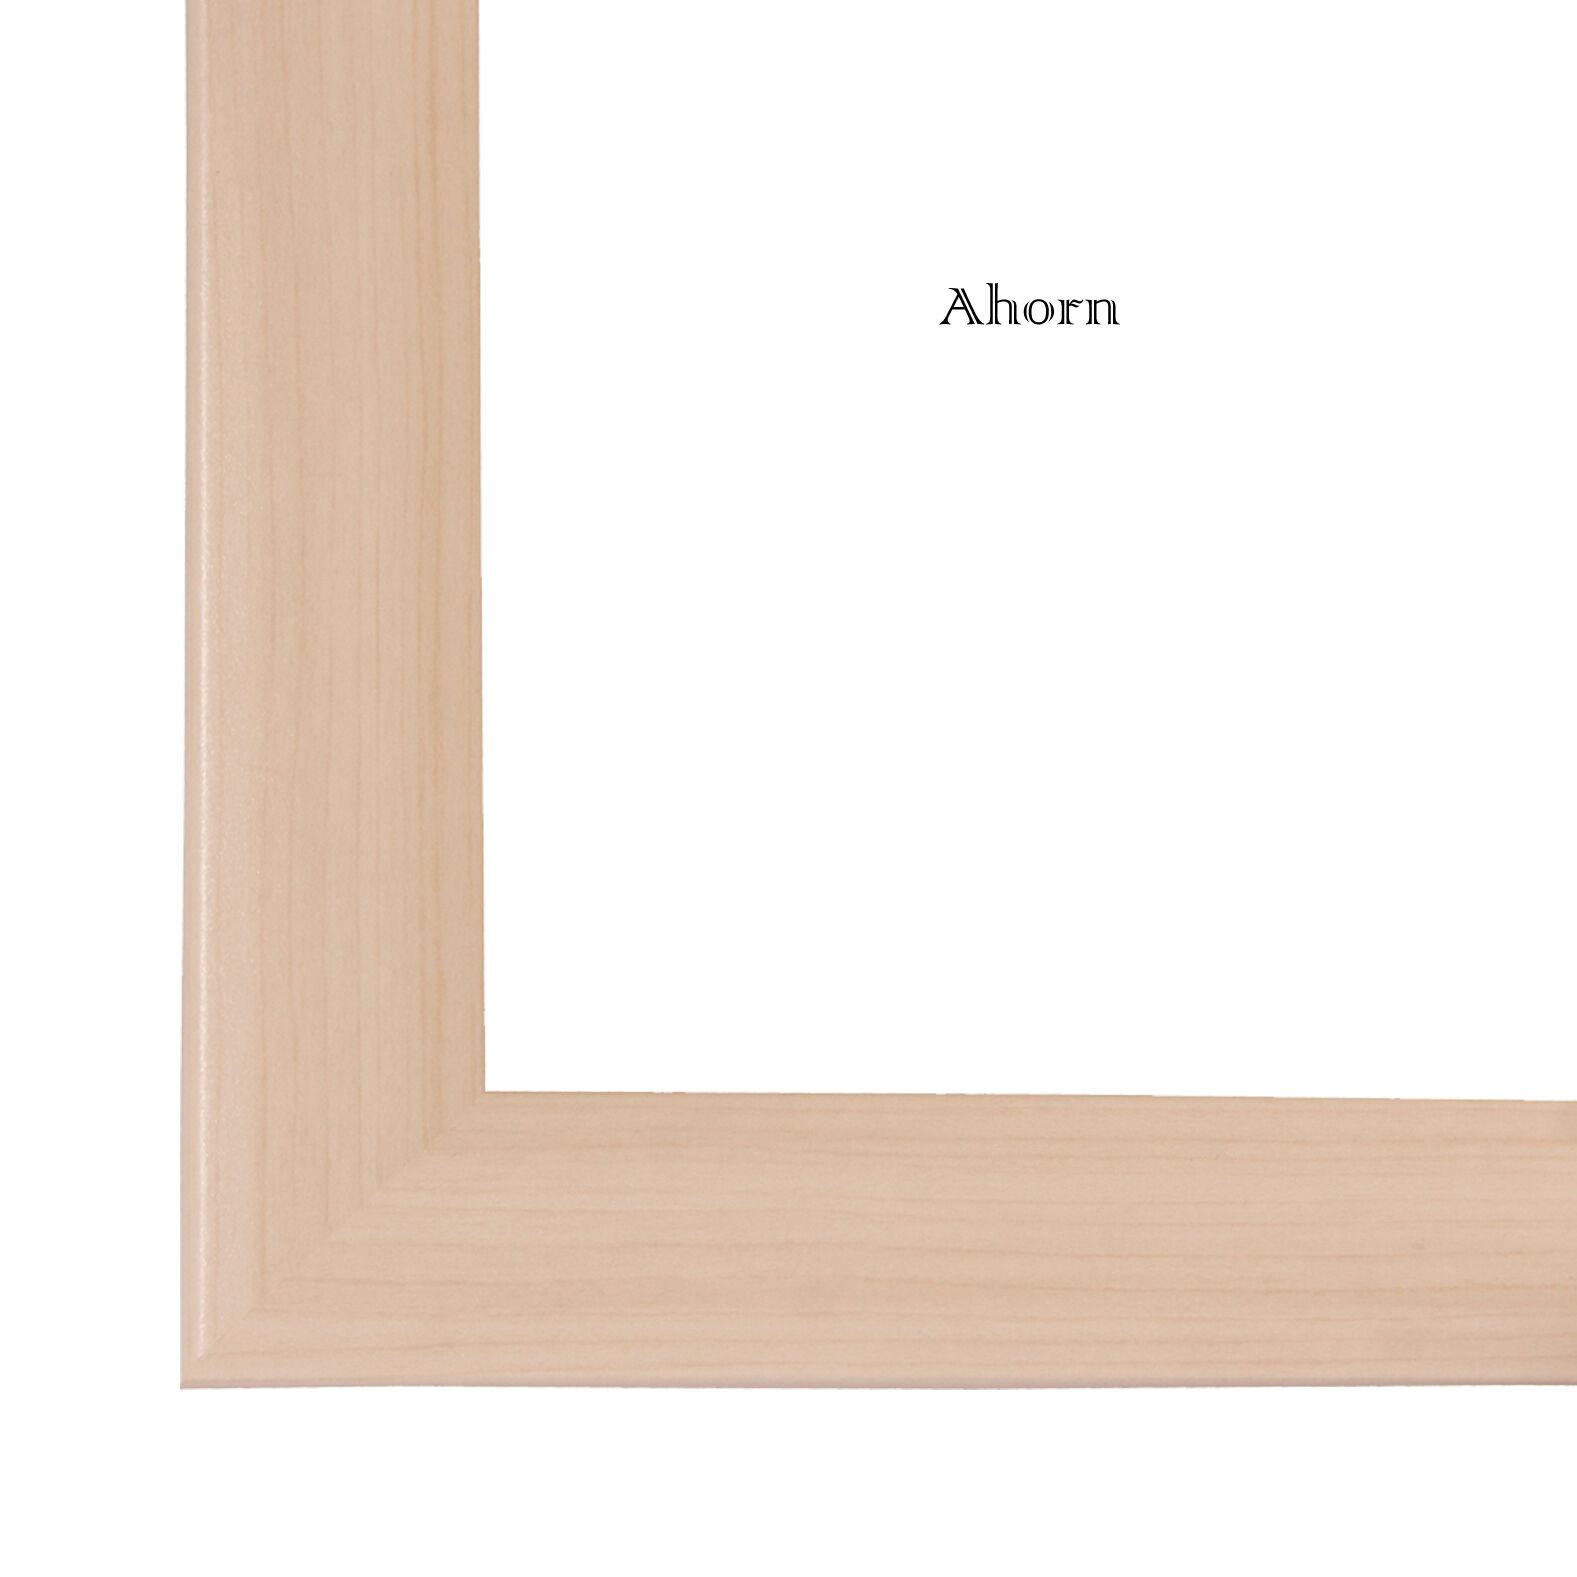 Bilderrahmen 22 Farben ab ab ab 63x118 bis 63x128 cm Foto Panorama Poster Rahmen Neu 1dfe76